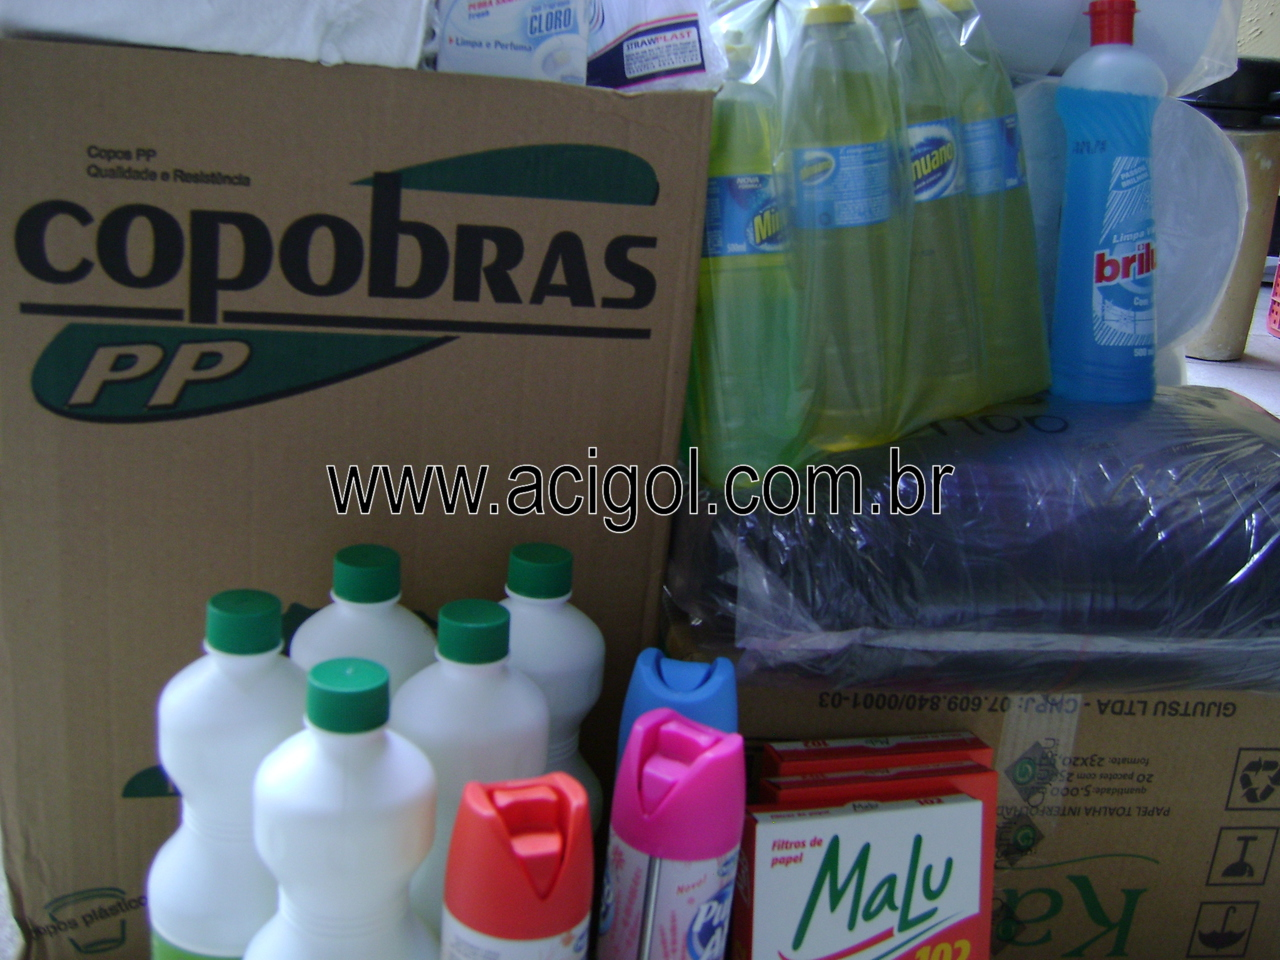 compra para consumo mensal-foto acigol 81 34451782-DSC08885